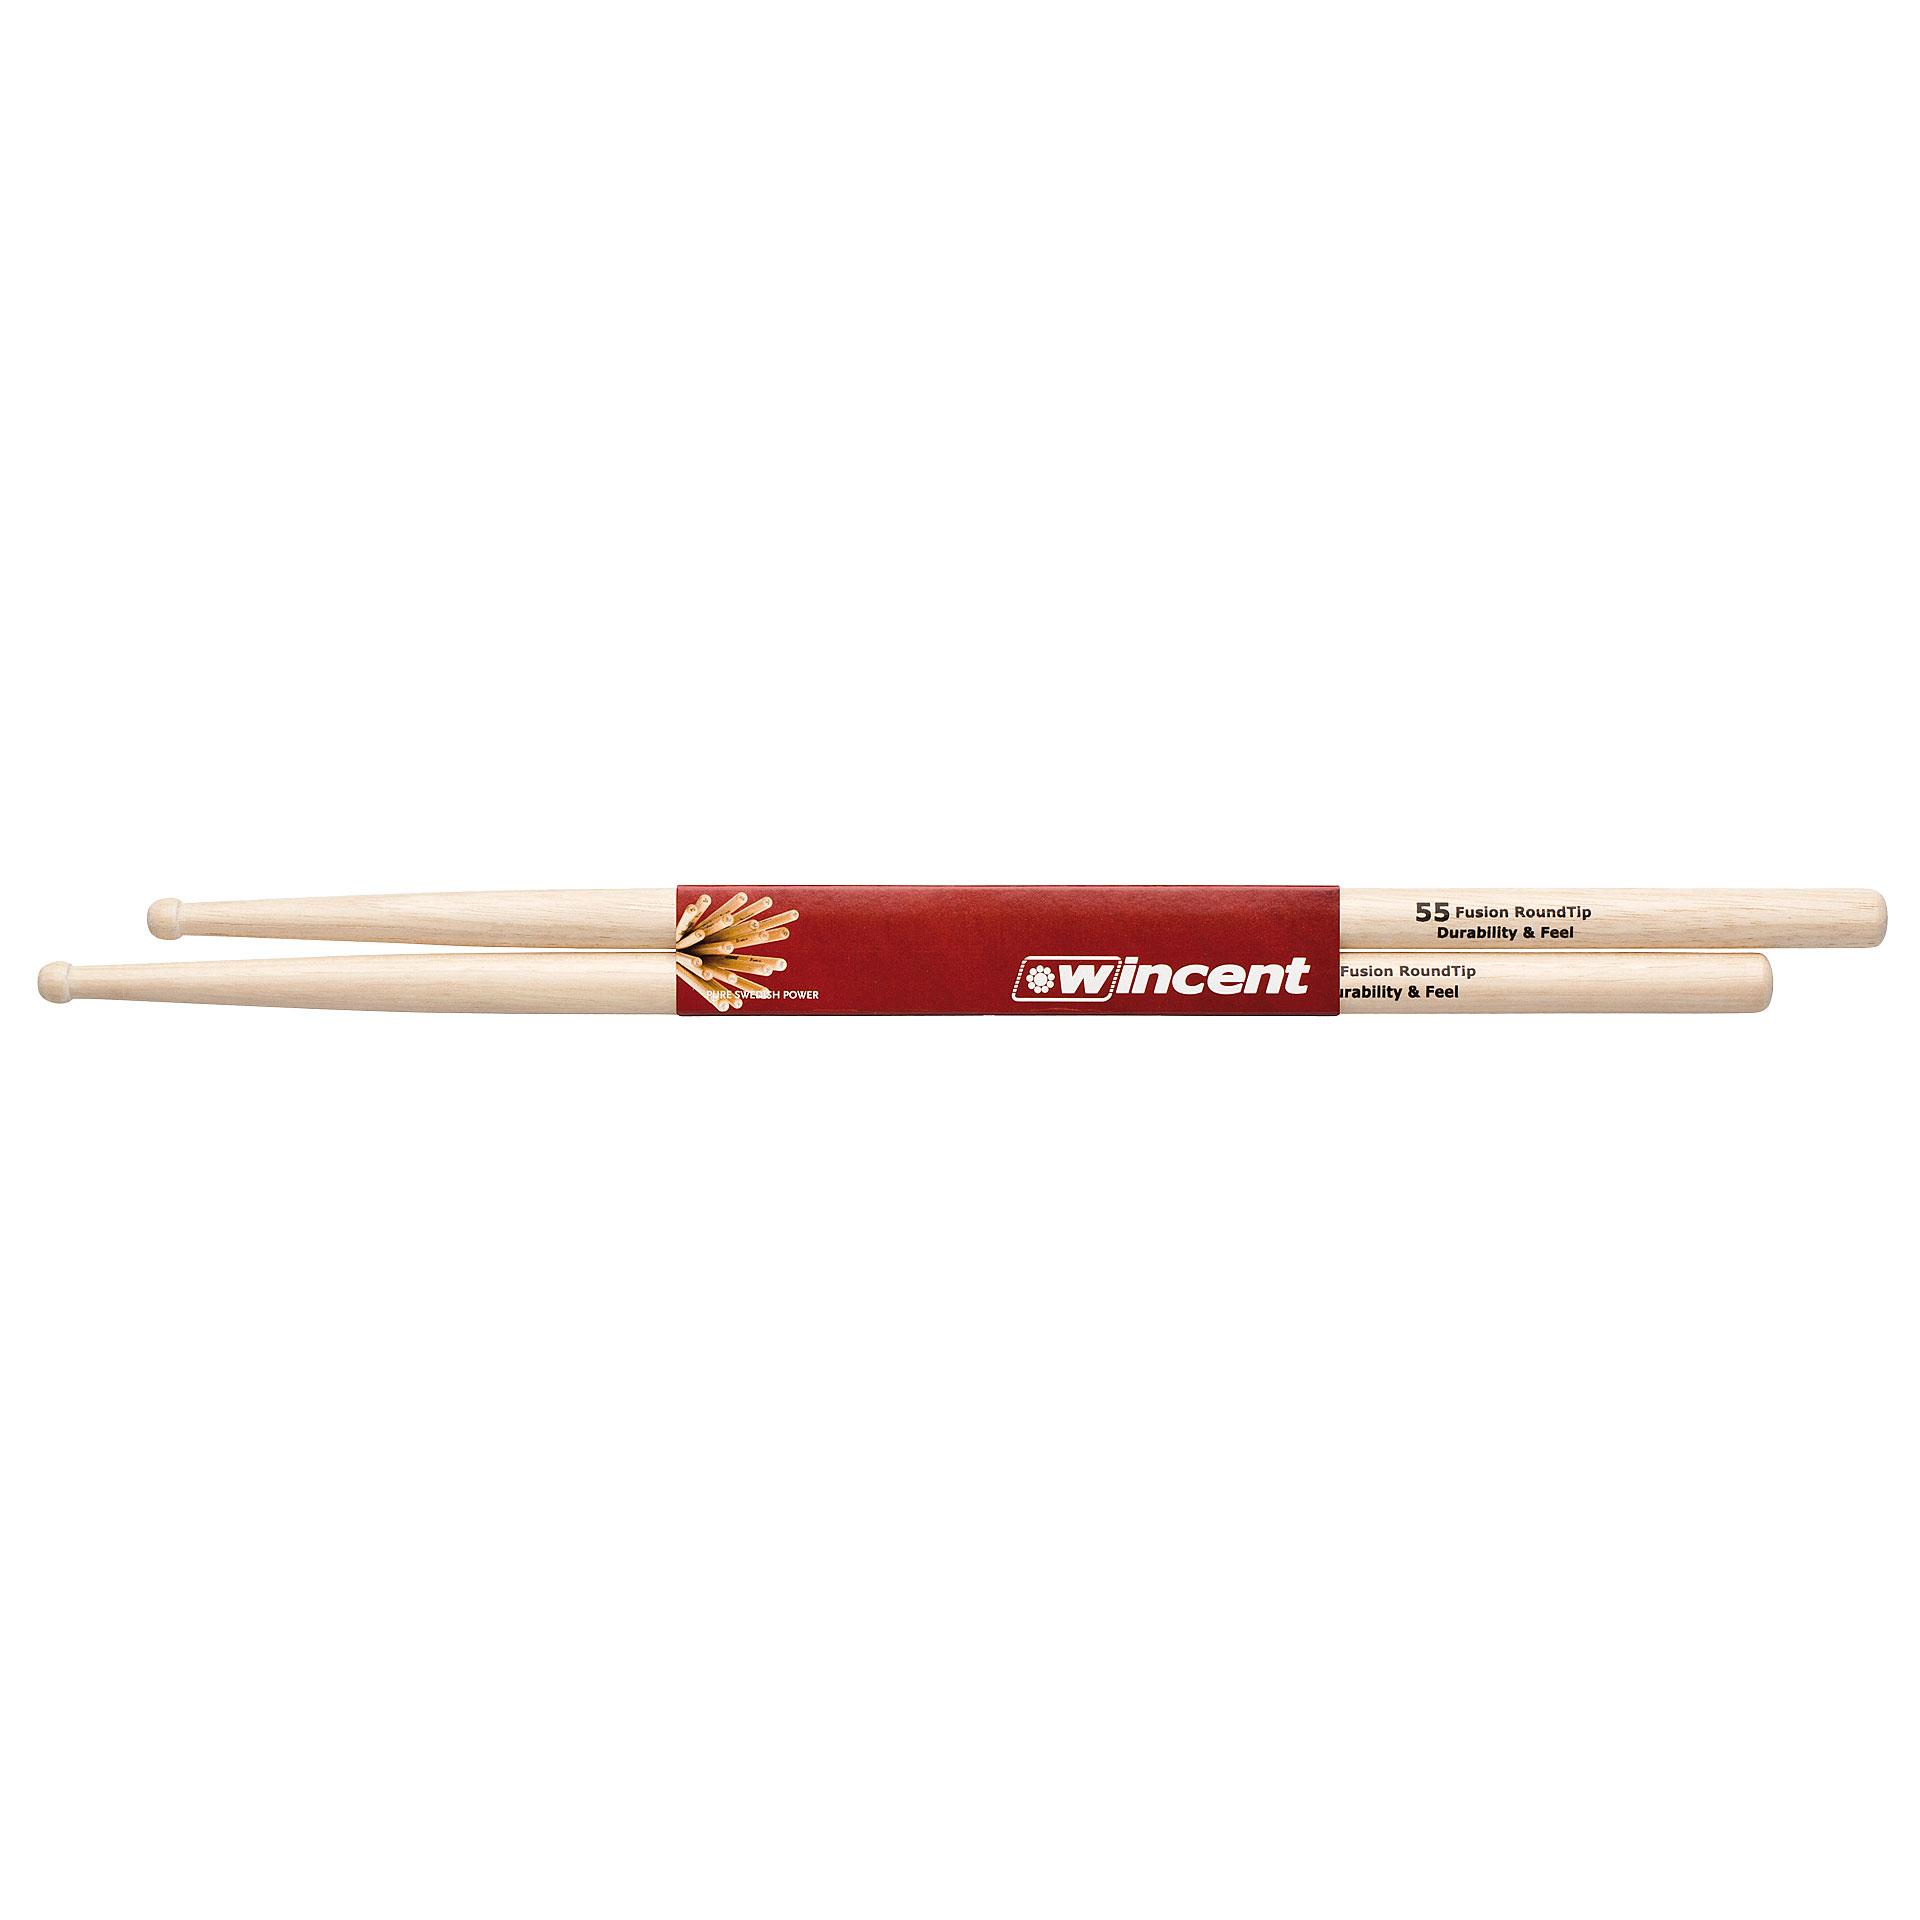 Wincent Drumsticks 55 Fusion Stick drumsticks